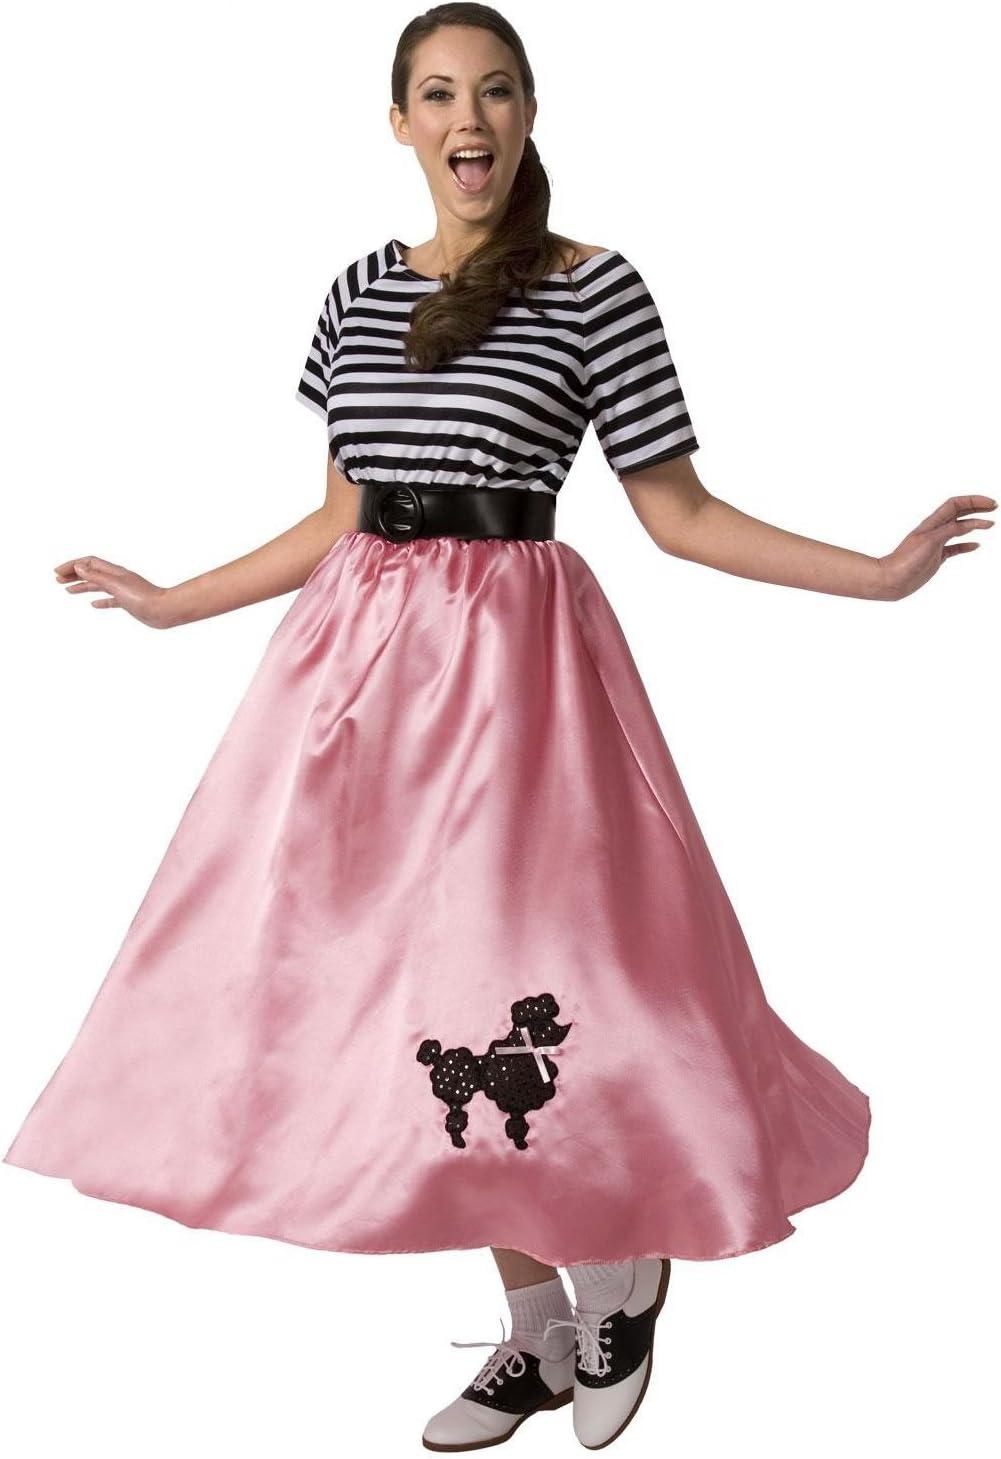 PALAMON - Disfraz de parisina para mujer, talla 50: Amazon.es ...